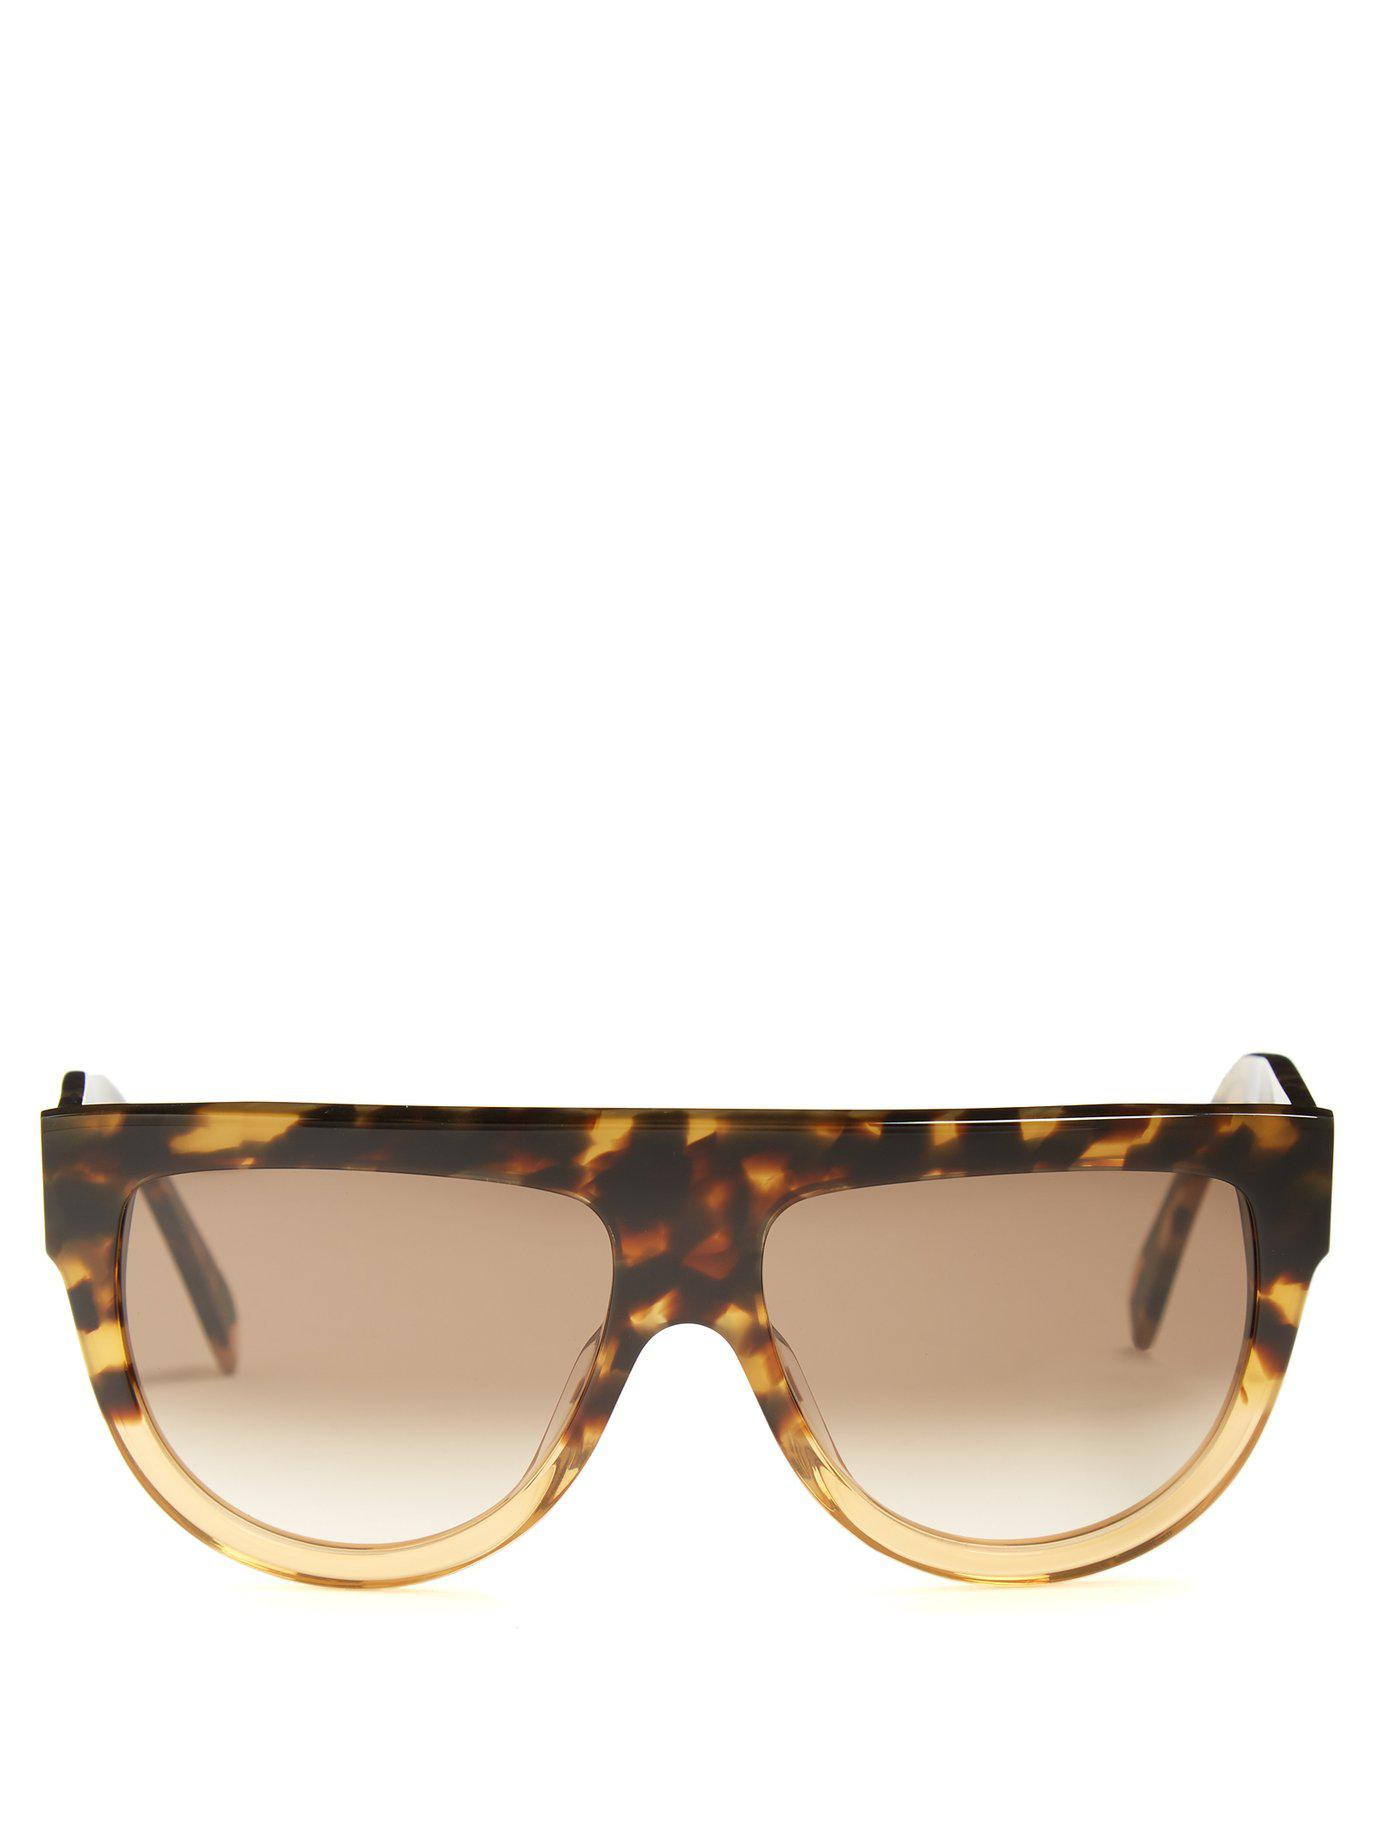 4549d6cd034 Lyst - Céline Shadow Aviator D Frame Acetate Sunglasses in Brown